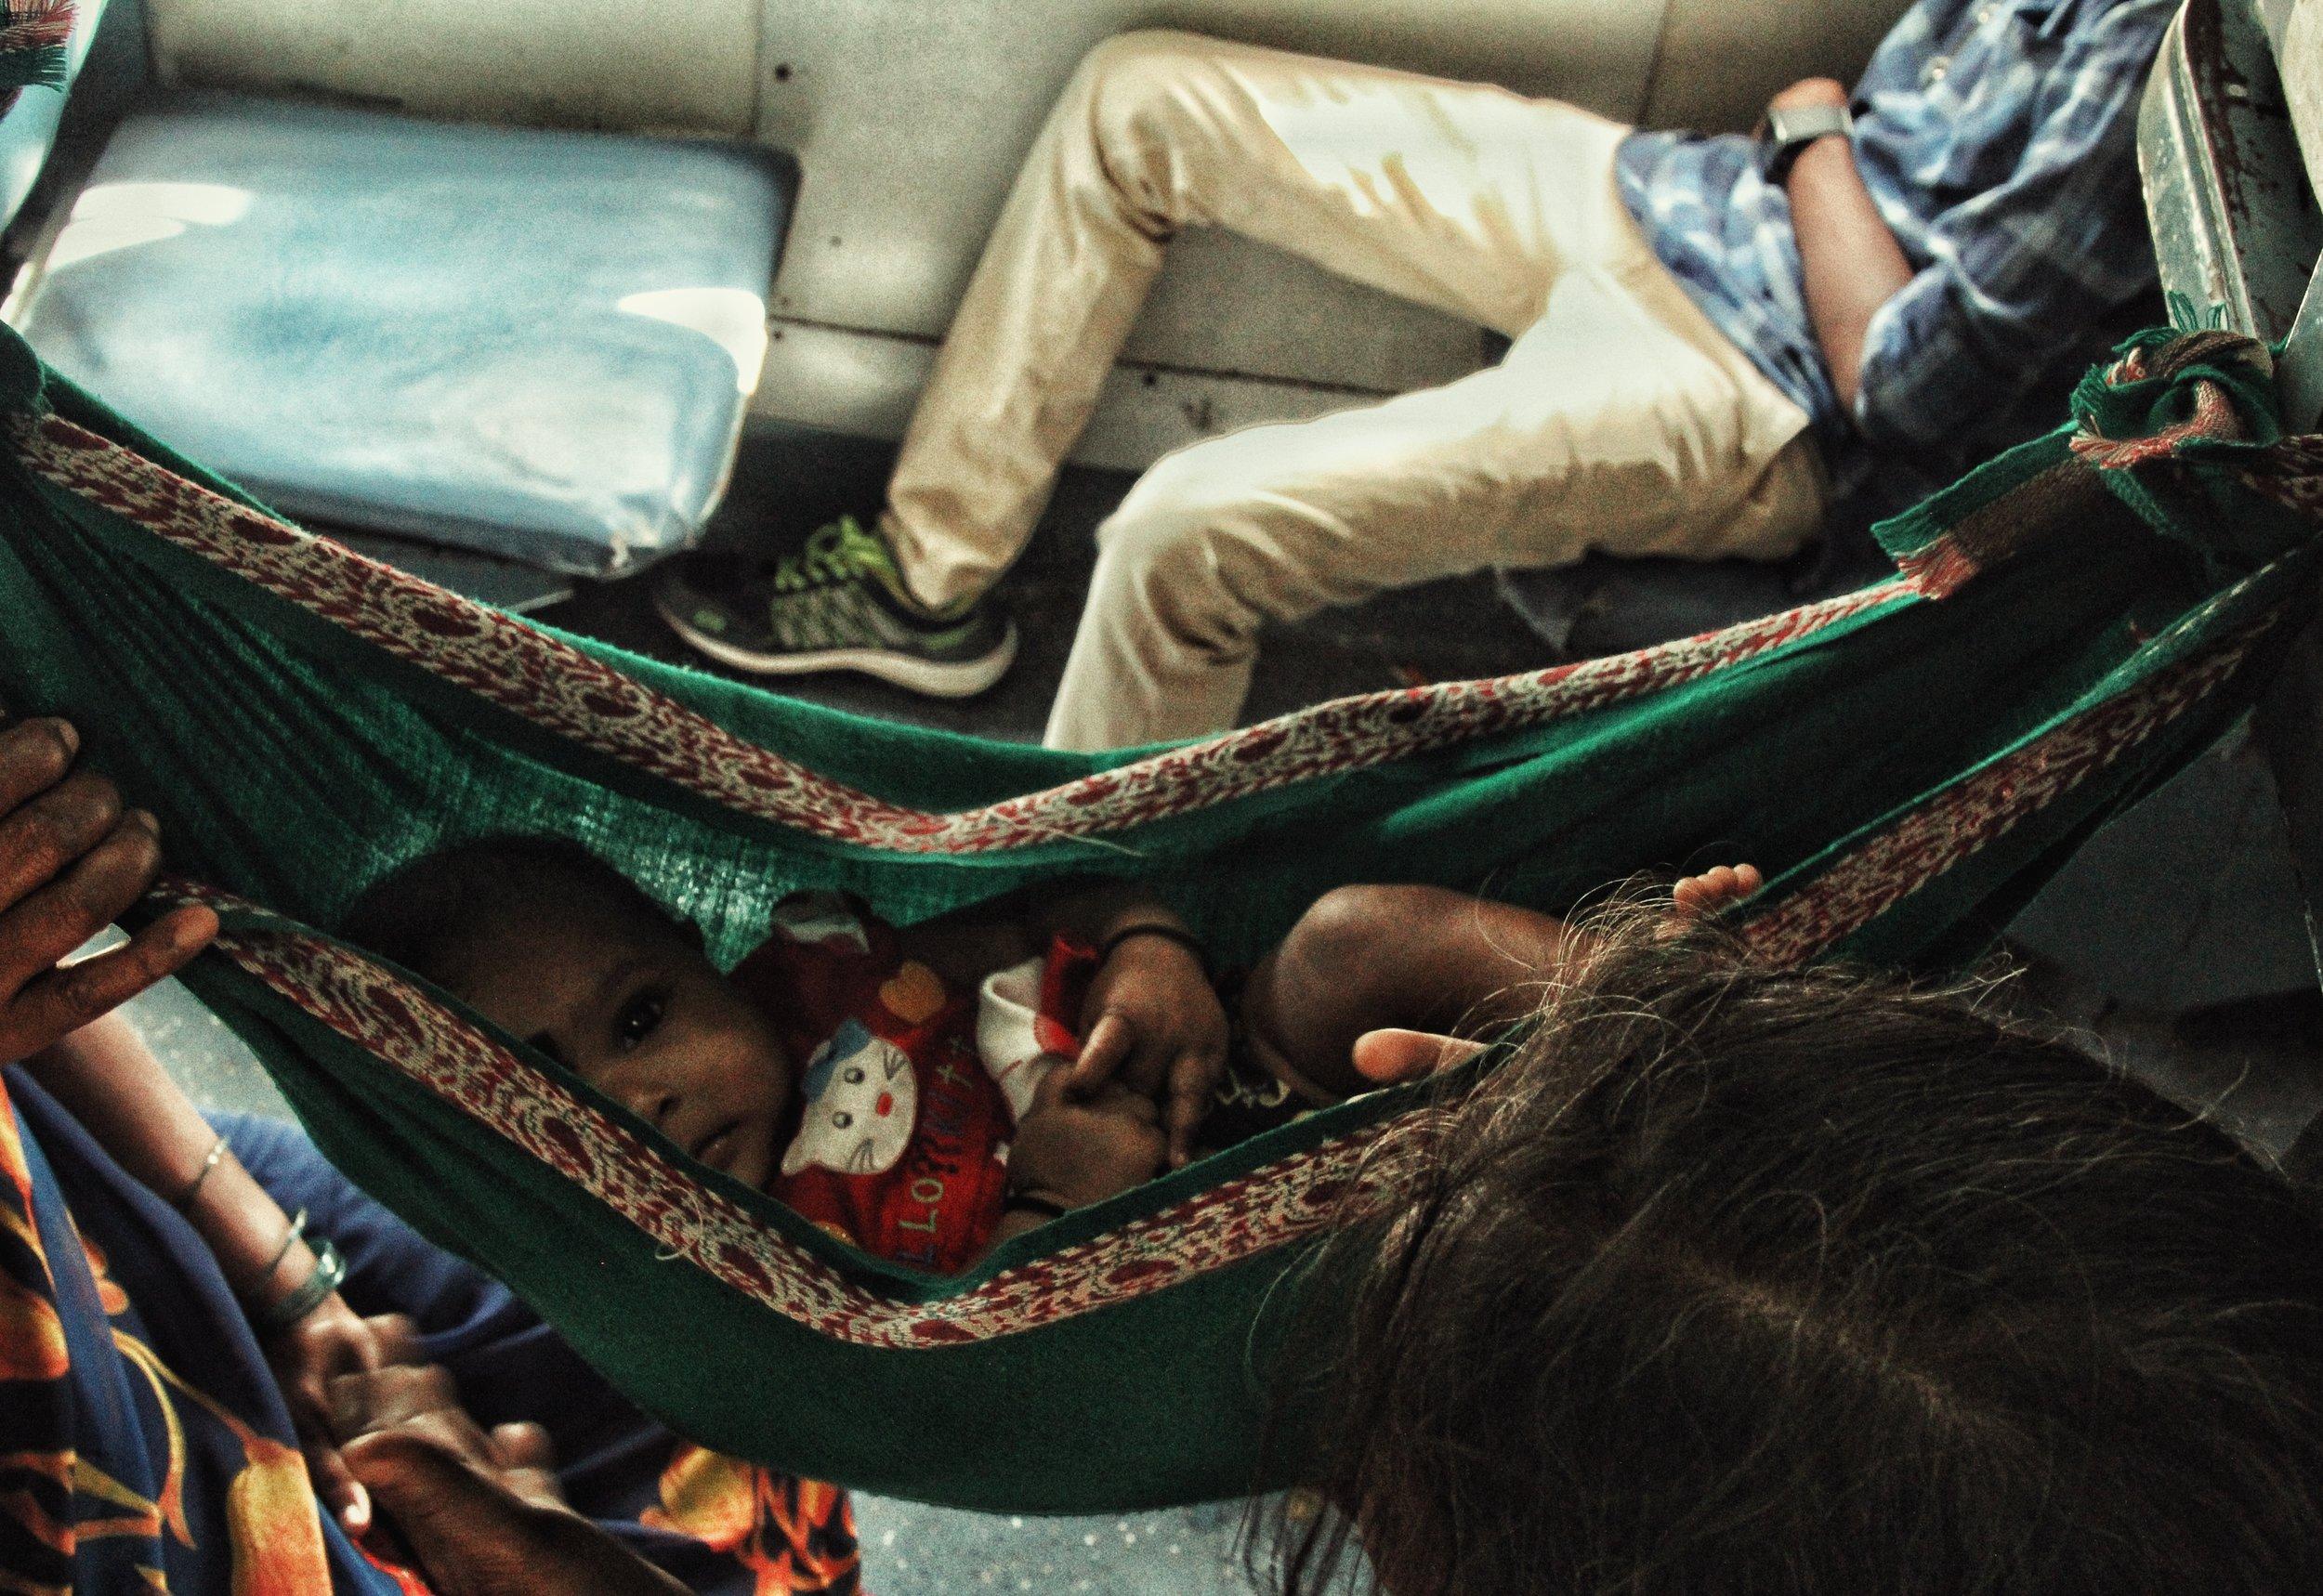 Sleeper class of an Indian train, Mumbai 2017